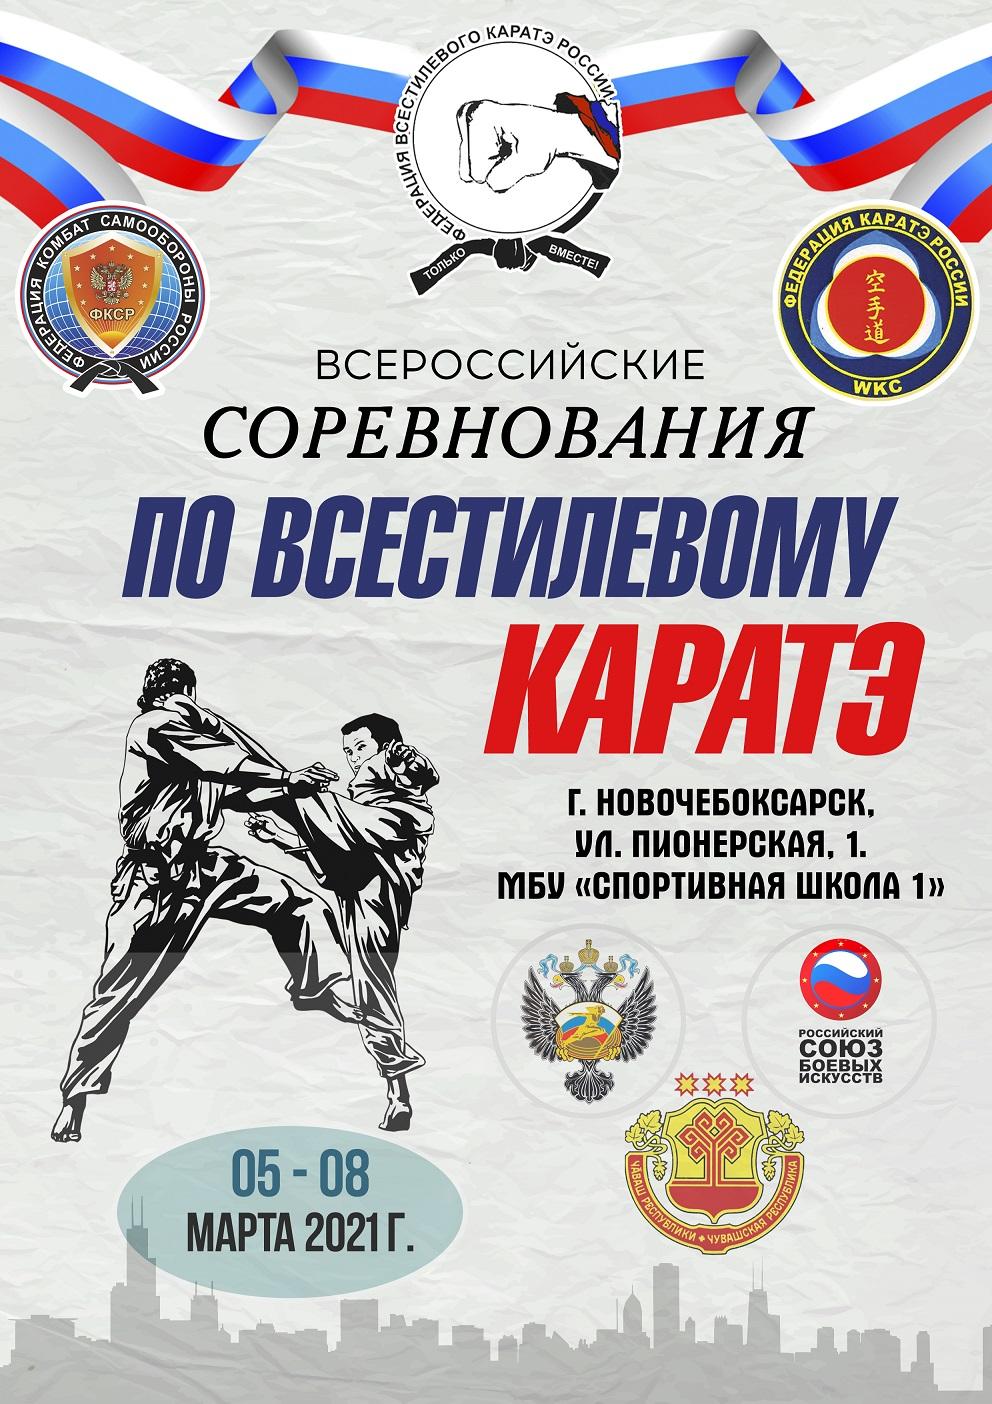 http://combatsd.ru/images/upload/афиша%20март%2021.jpg